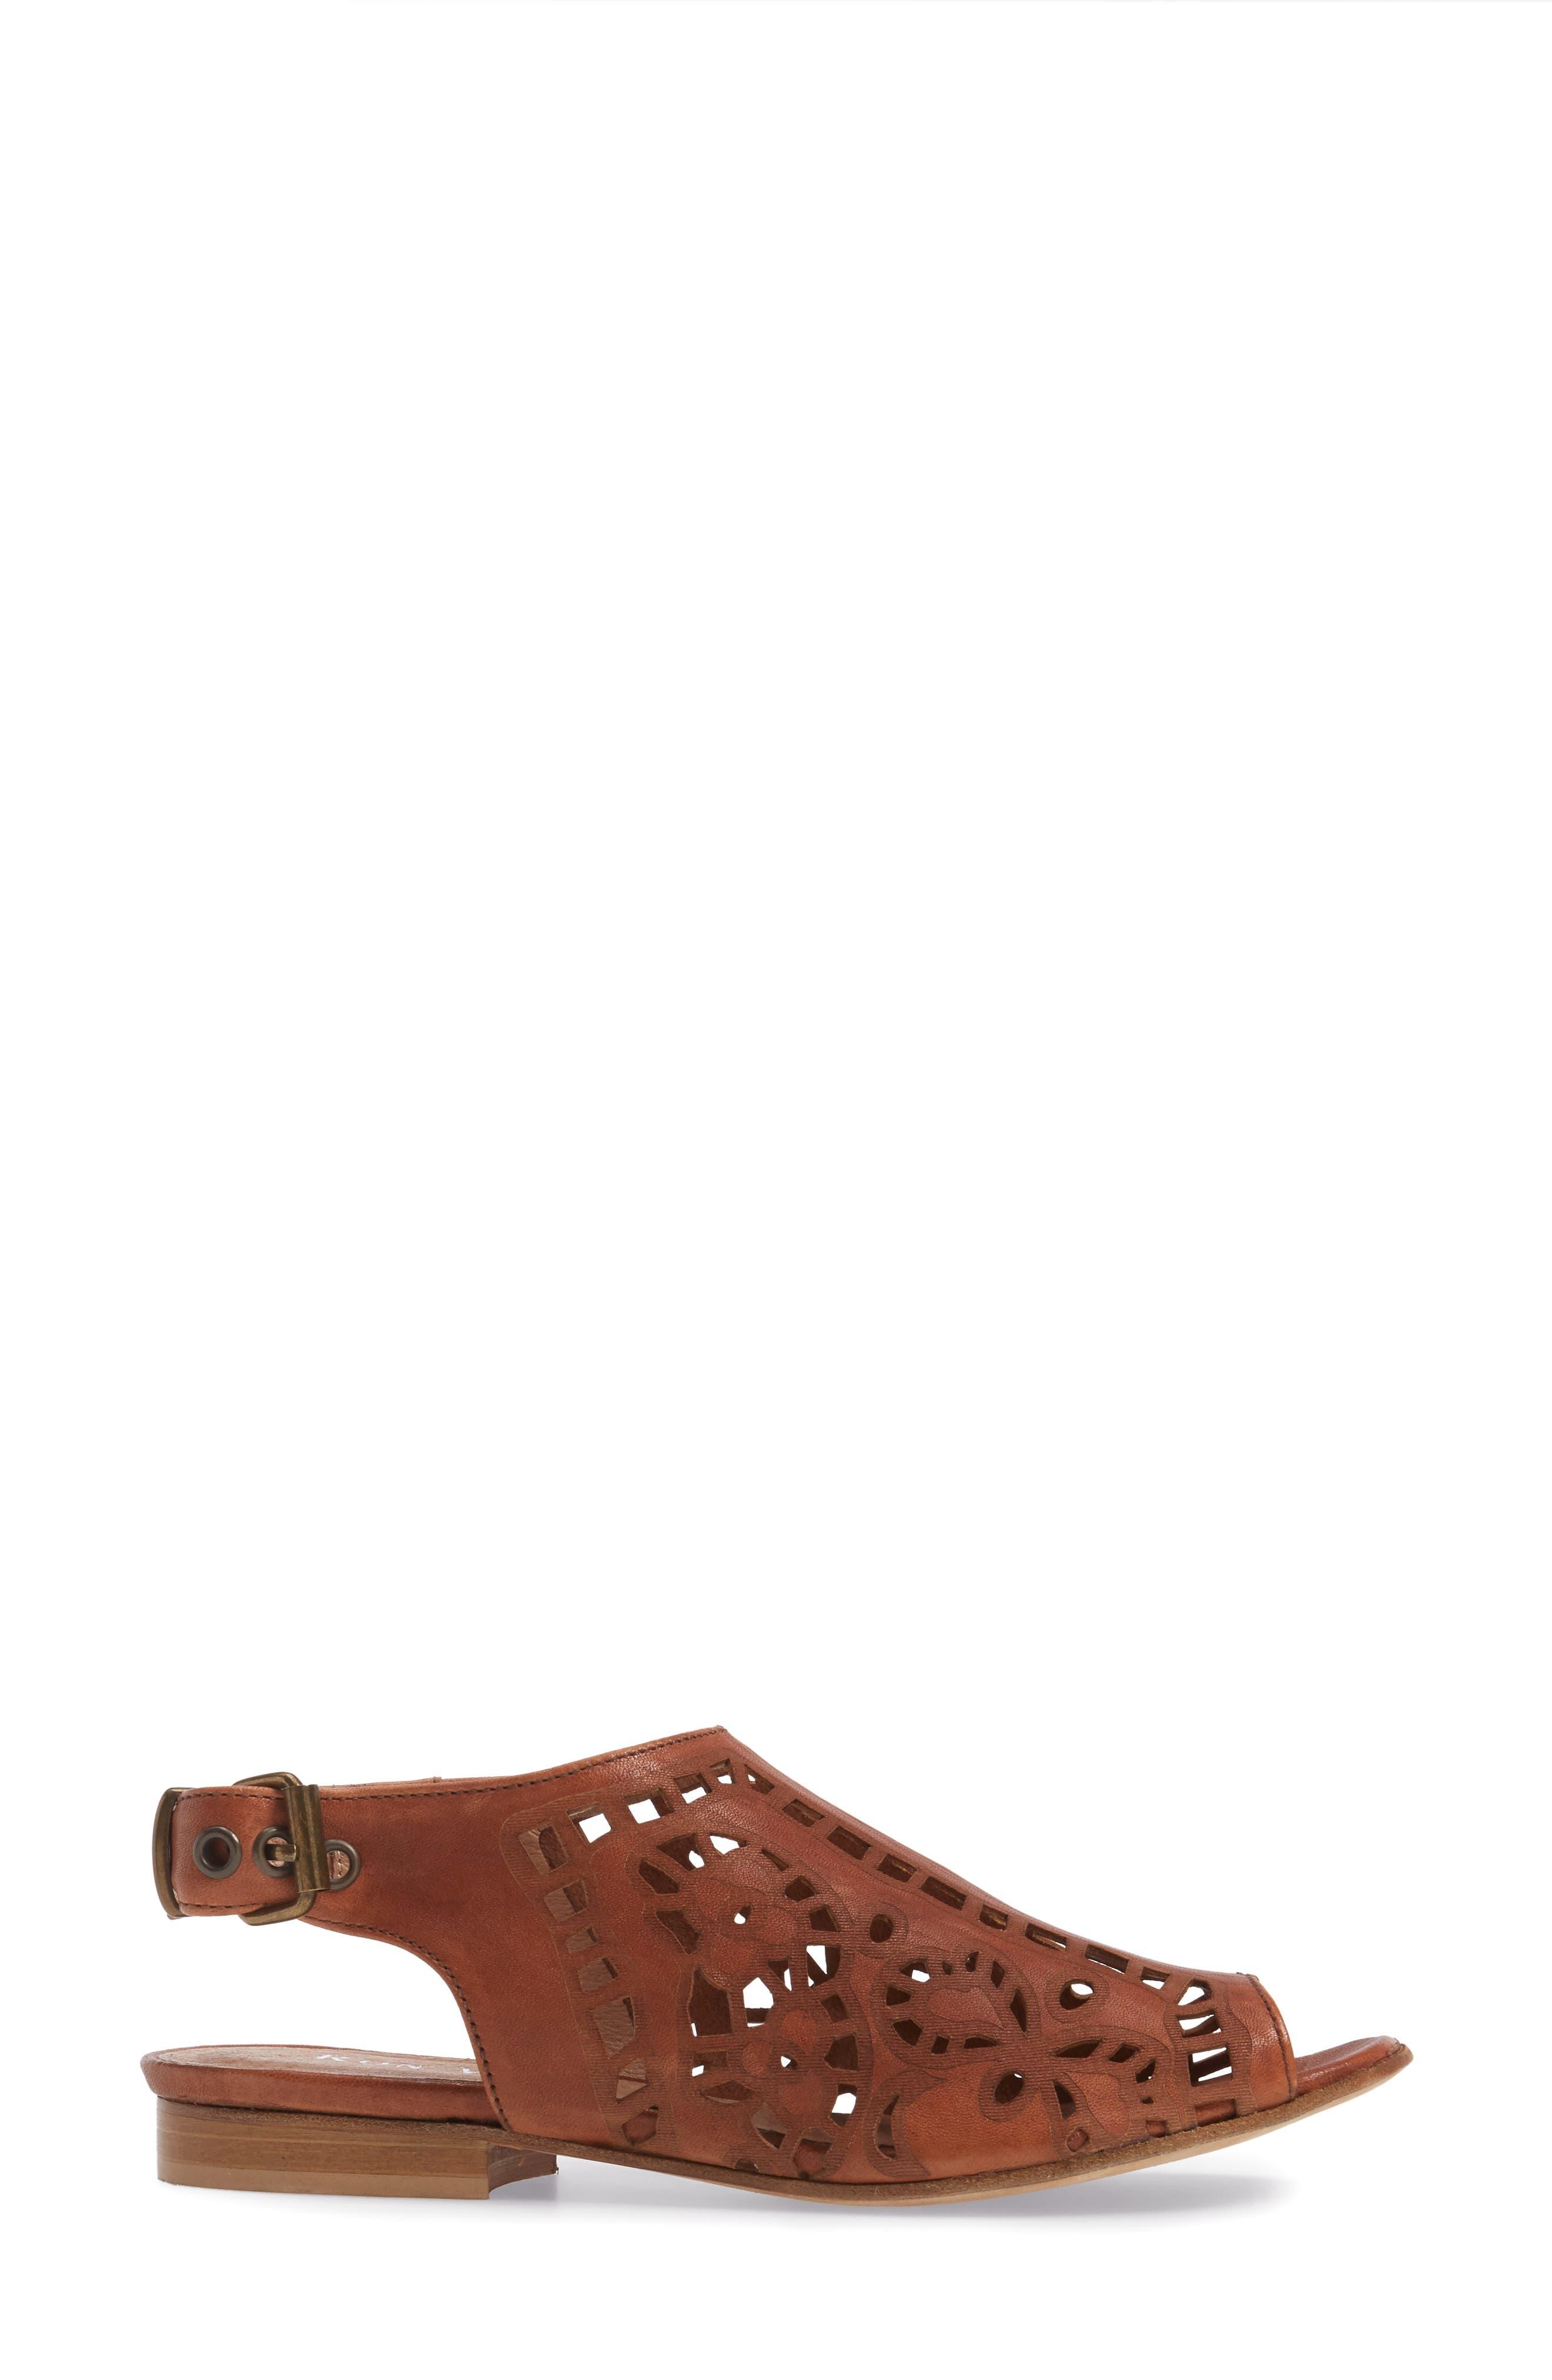 Ally Slingback Sandal,                             Alternate thumbnail 3, color,                             Cognac Leather